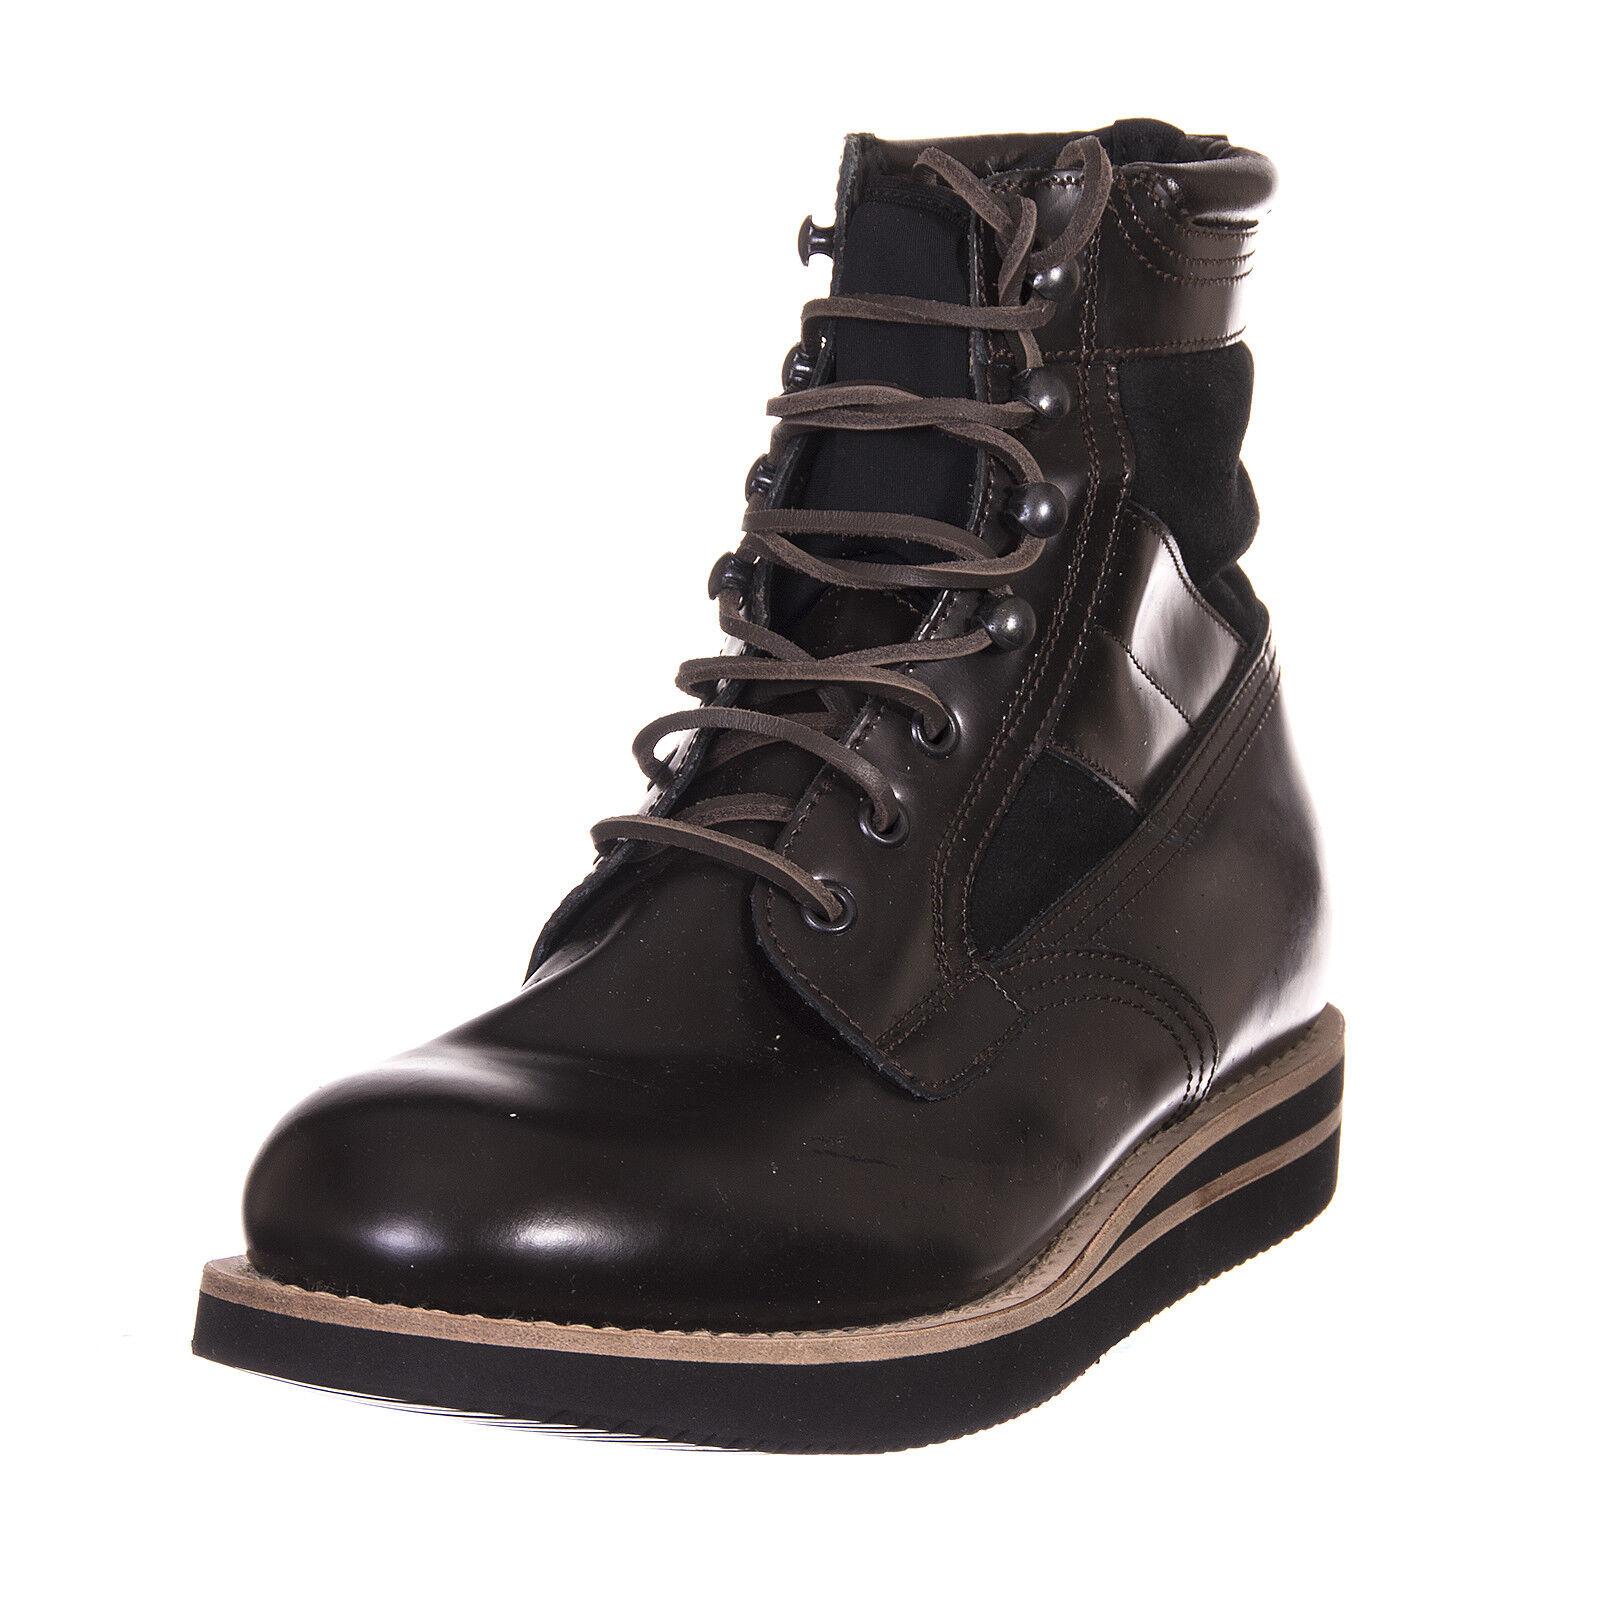 BEPOSITIVE zapato 43 Zapatos campionario sample hombre man marrone EU 43 zapato - 807 M72 365967